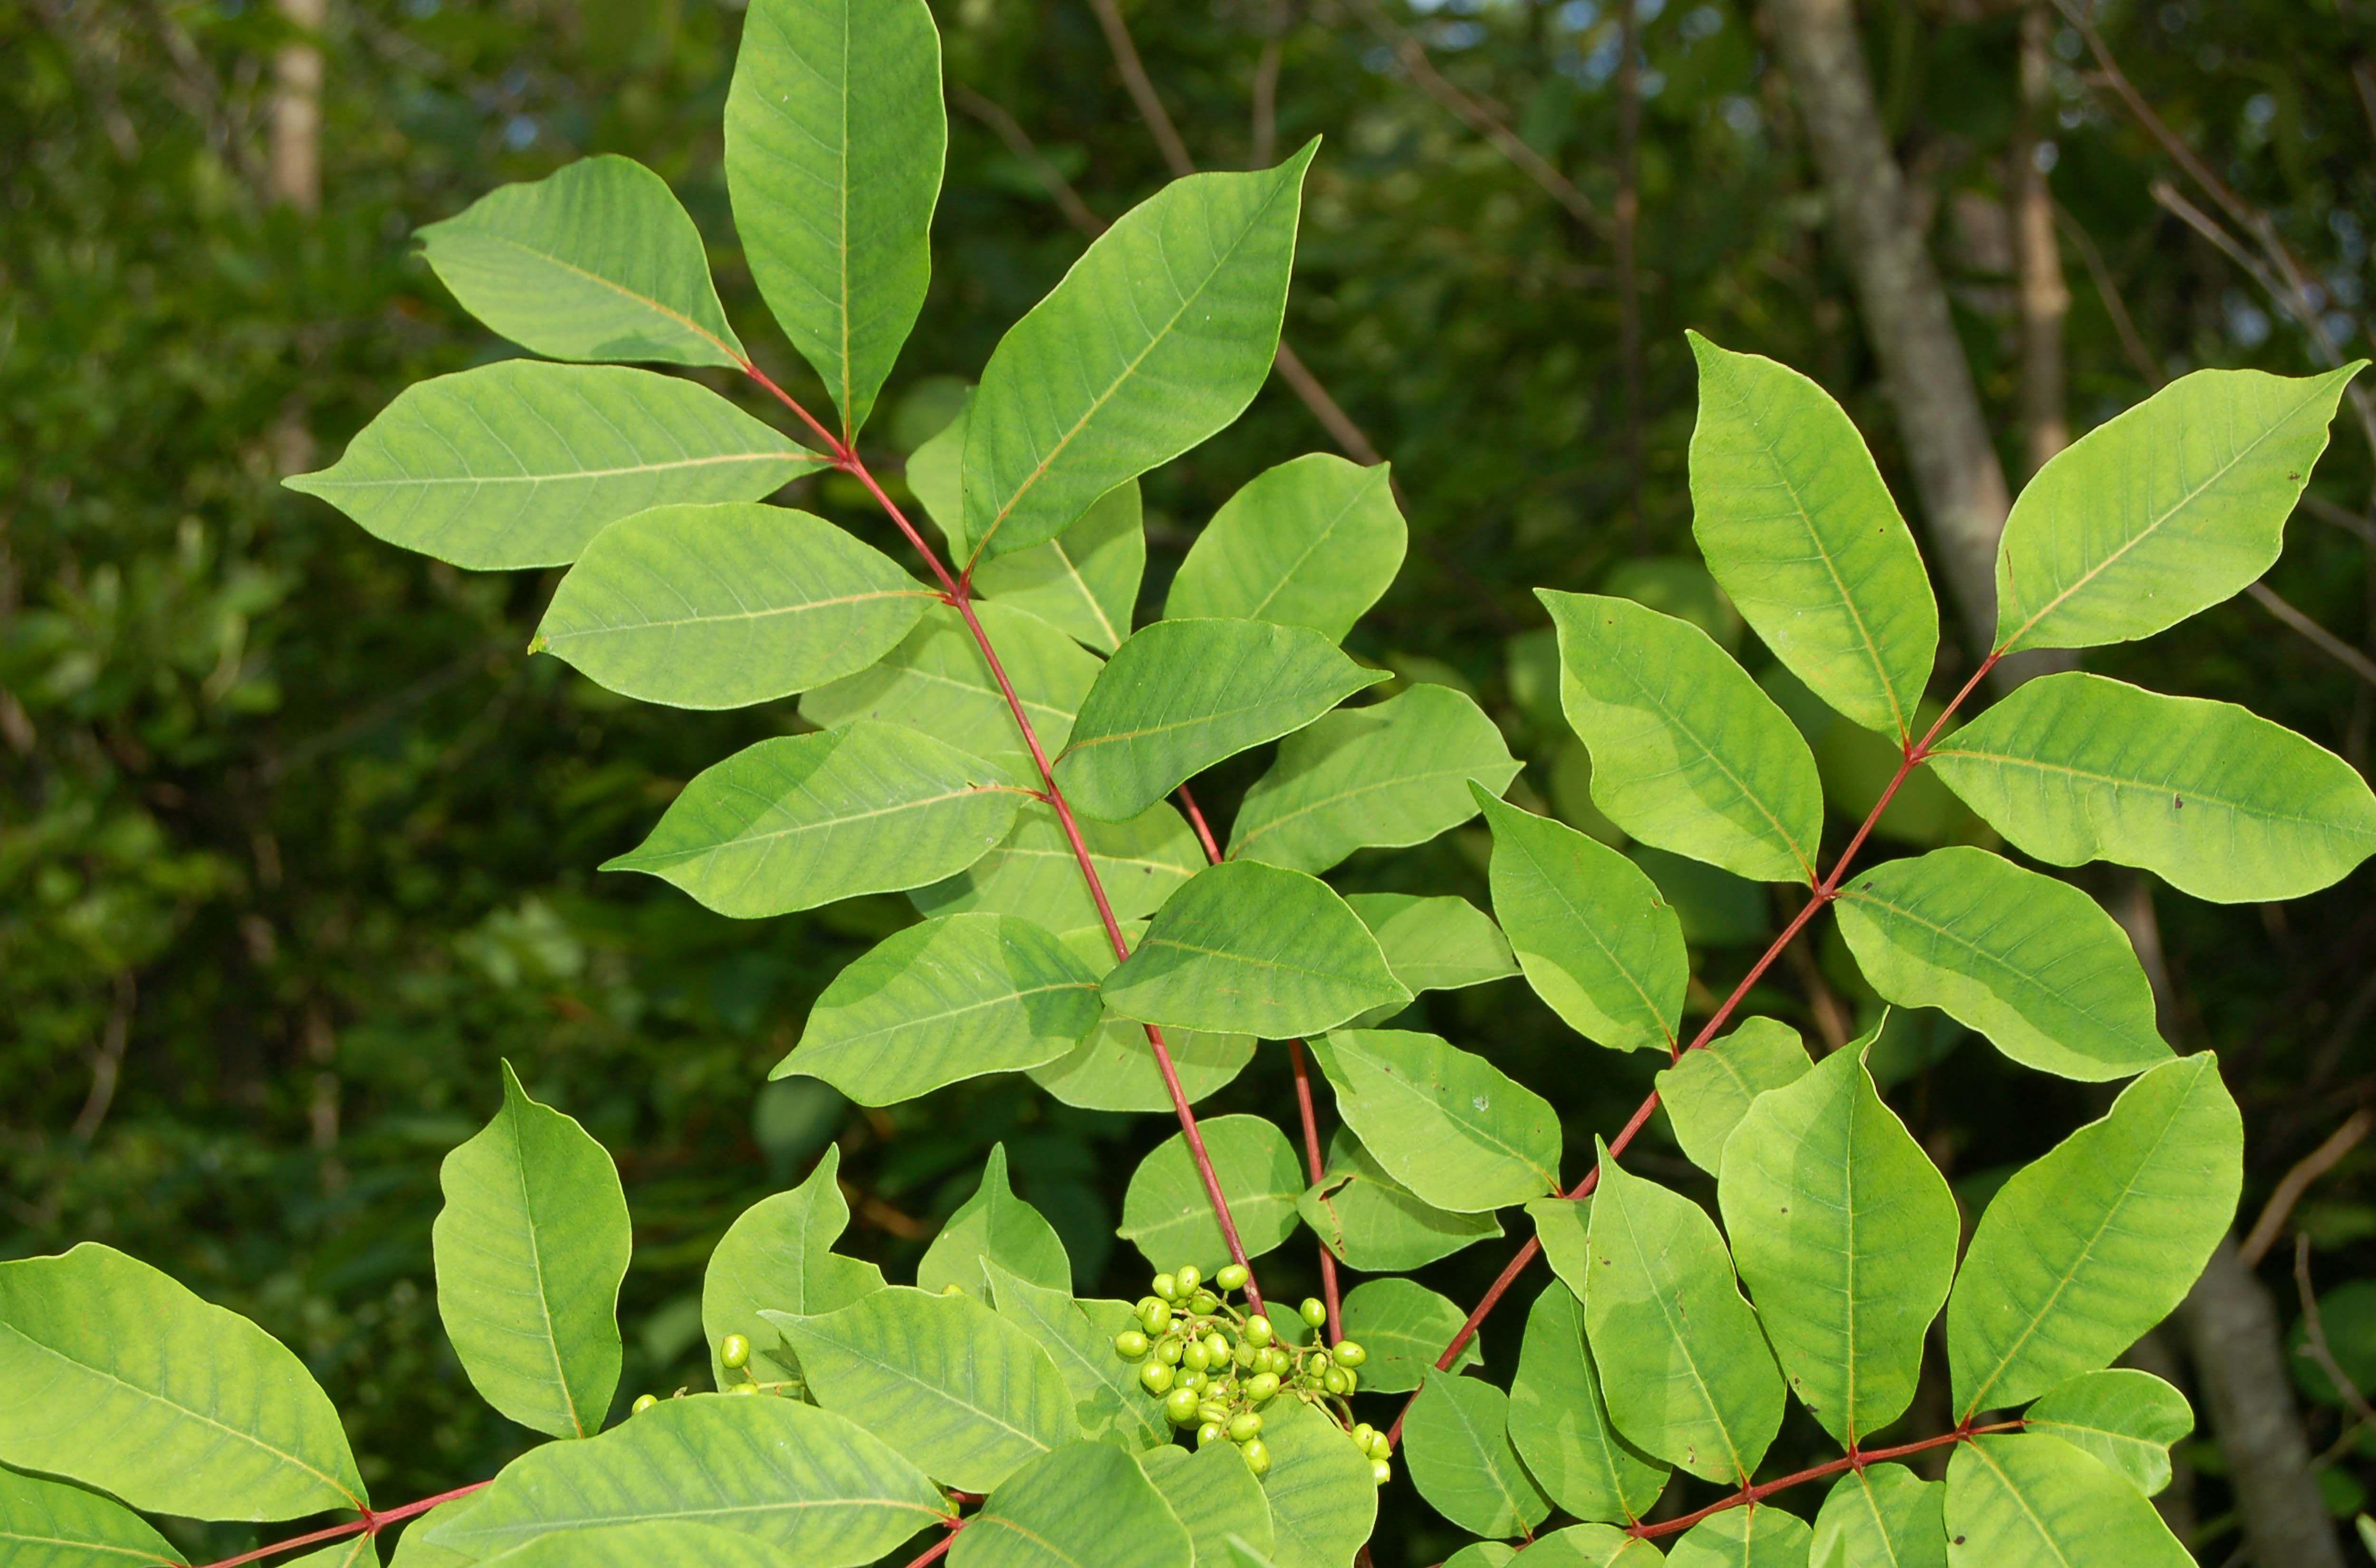 Pinnately-compound leaves of poison sumac.